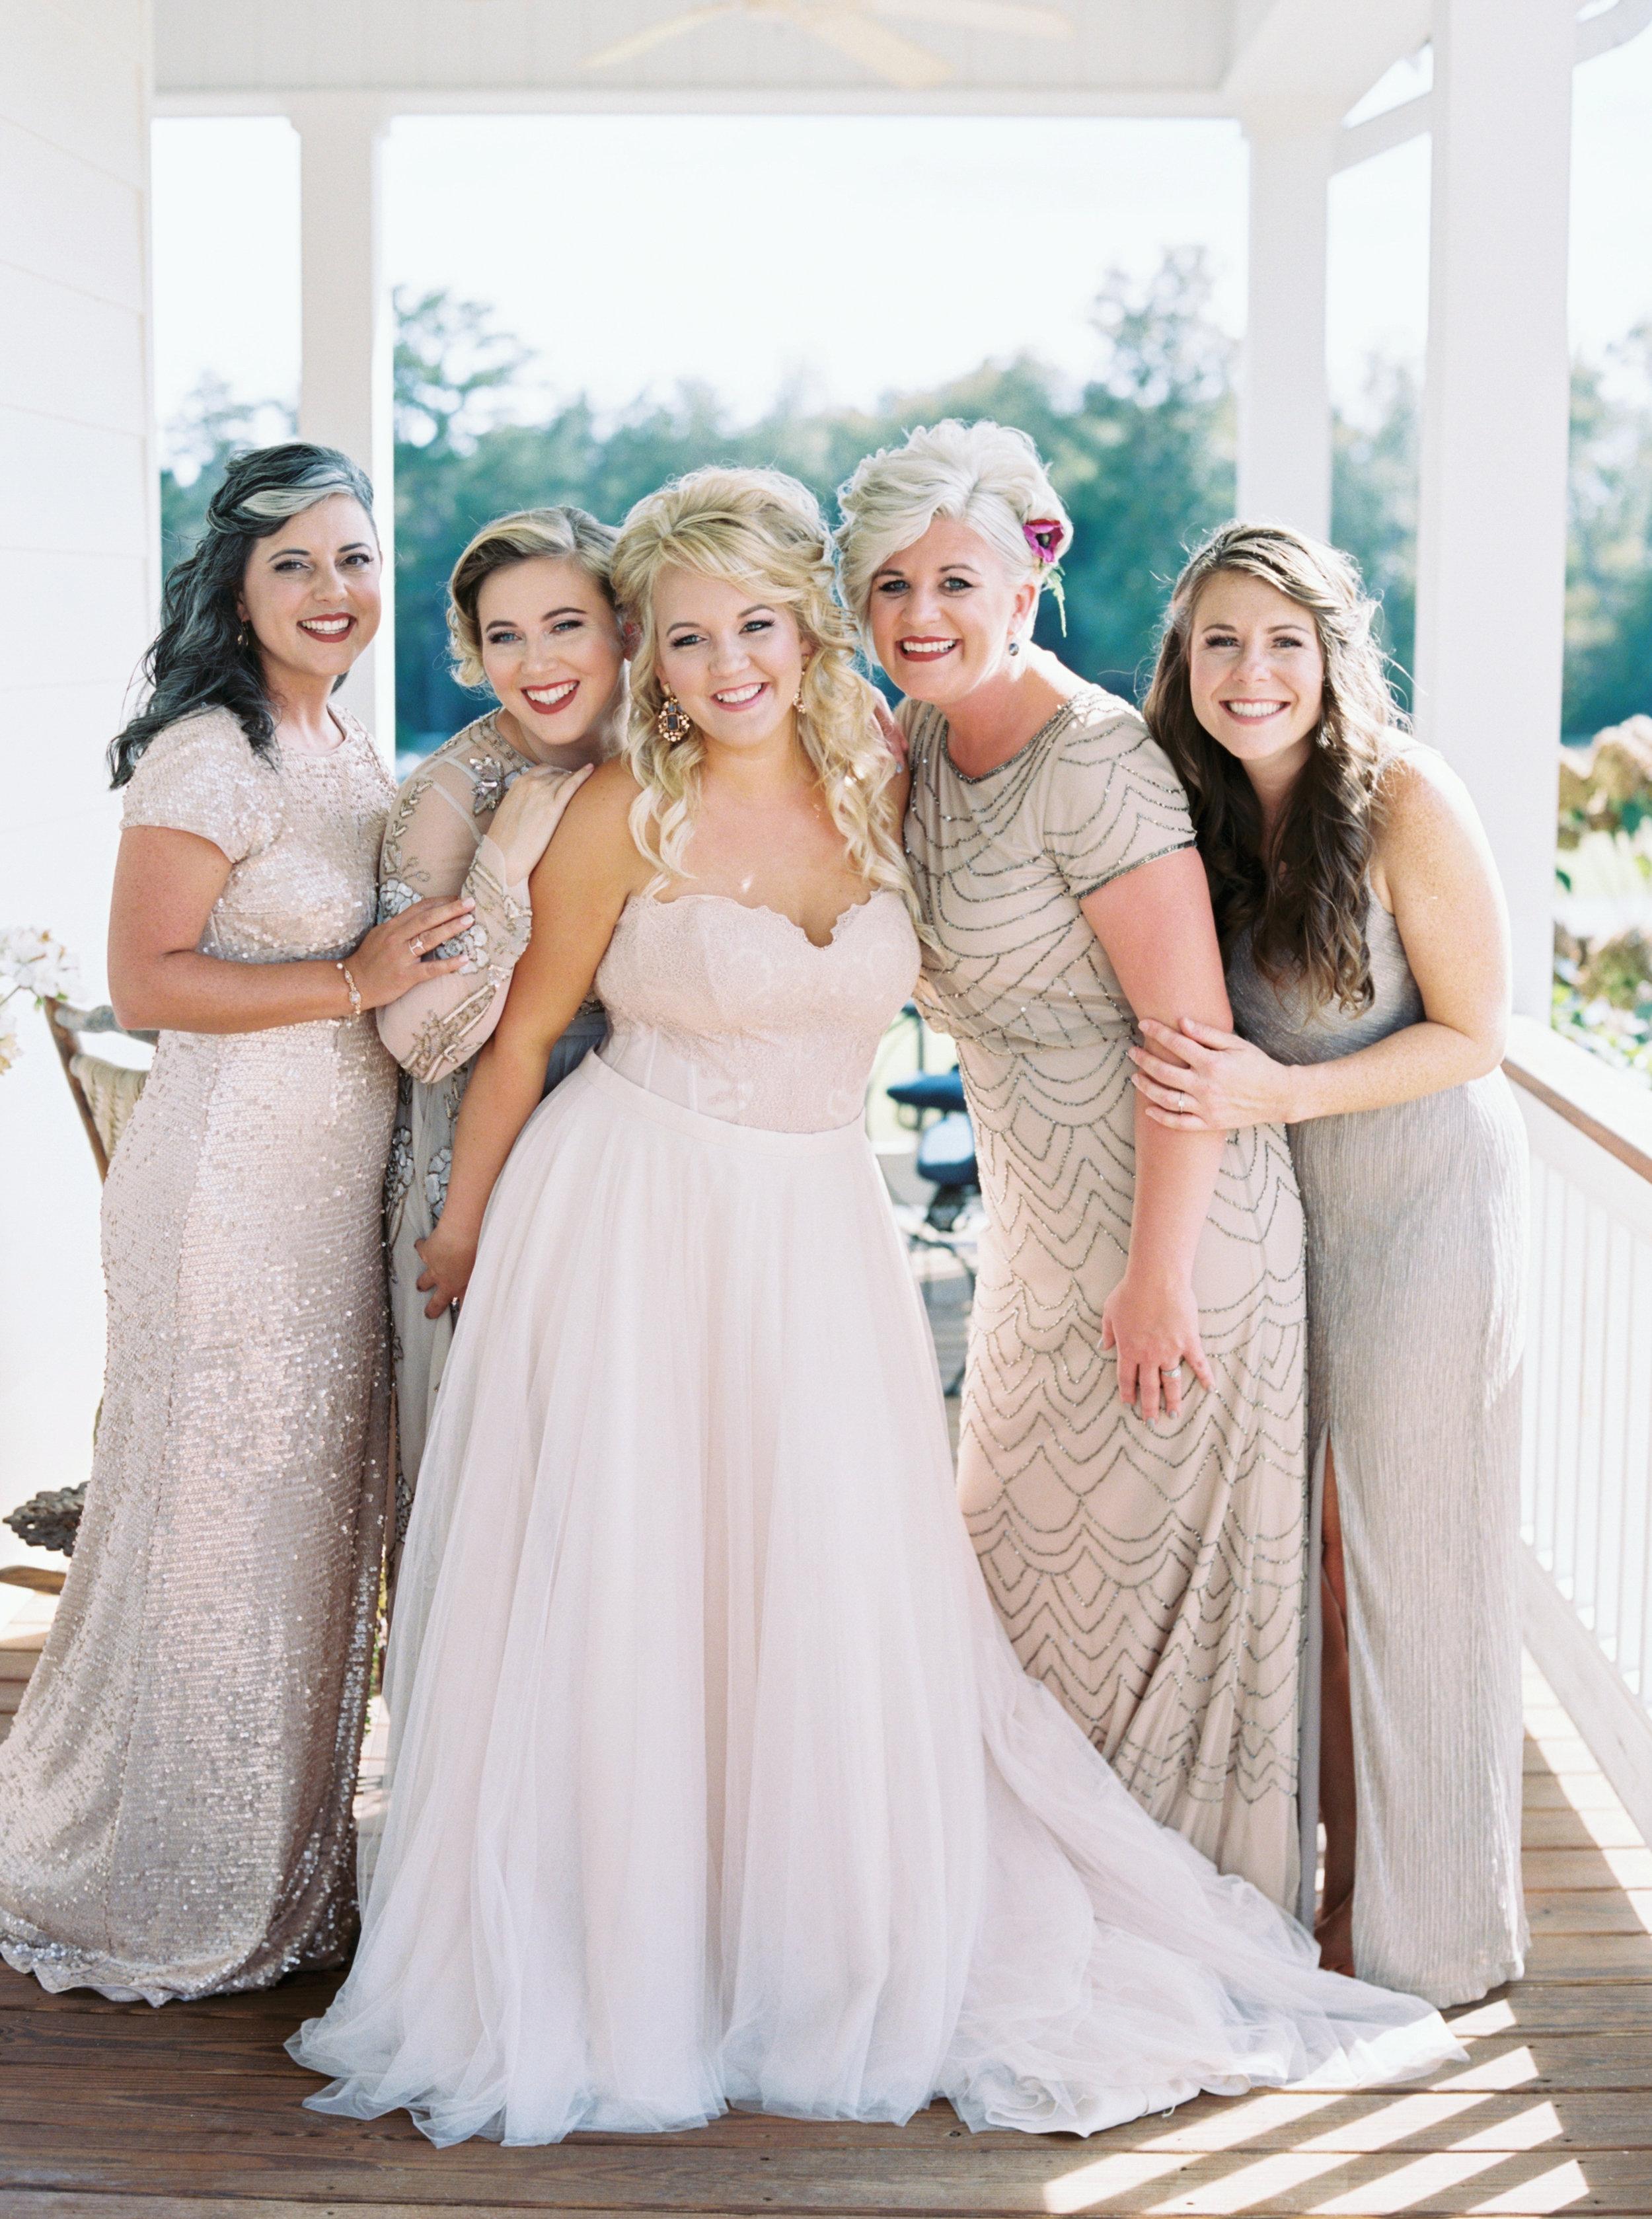 Mandi_Oliver_Chattanooga_Wedding_Abigail_Malone_Photography_Film-164.jpg